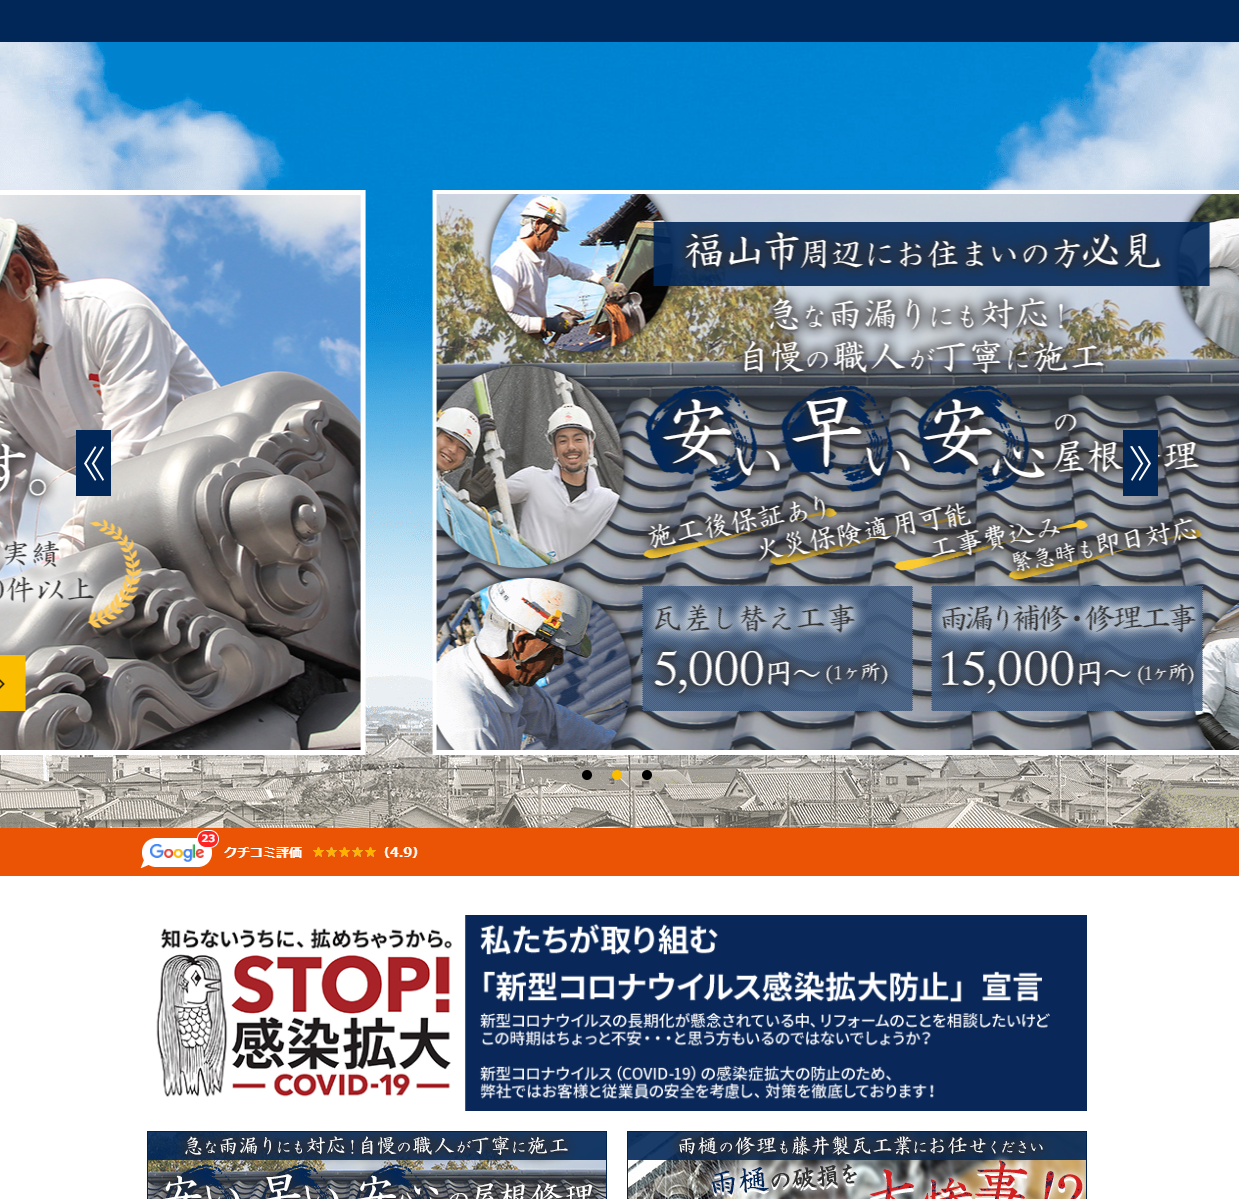 "<span class=""title"">藤井製瓦工業株式会社の口コミや評判</span>"